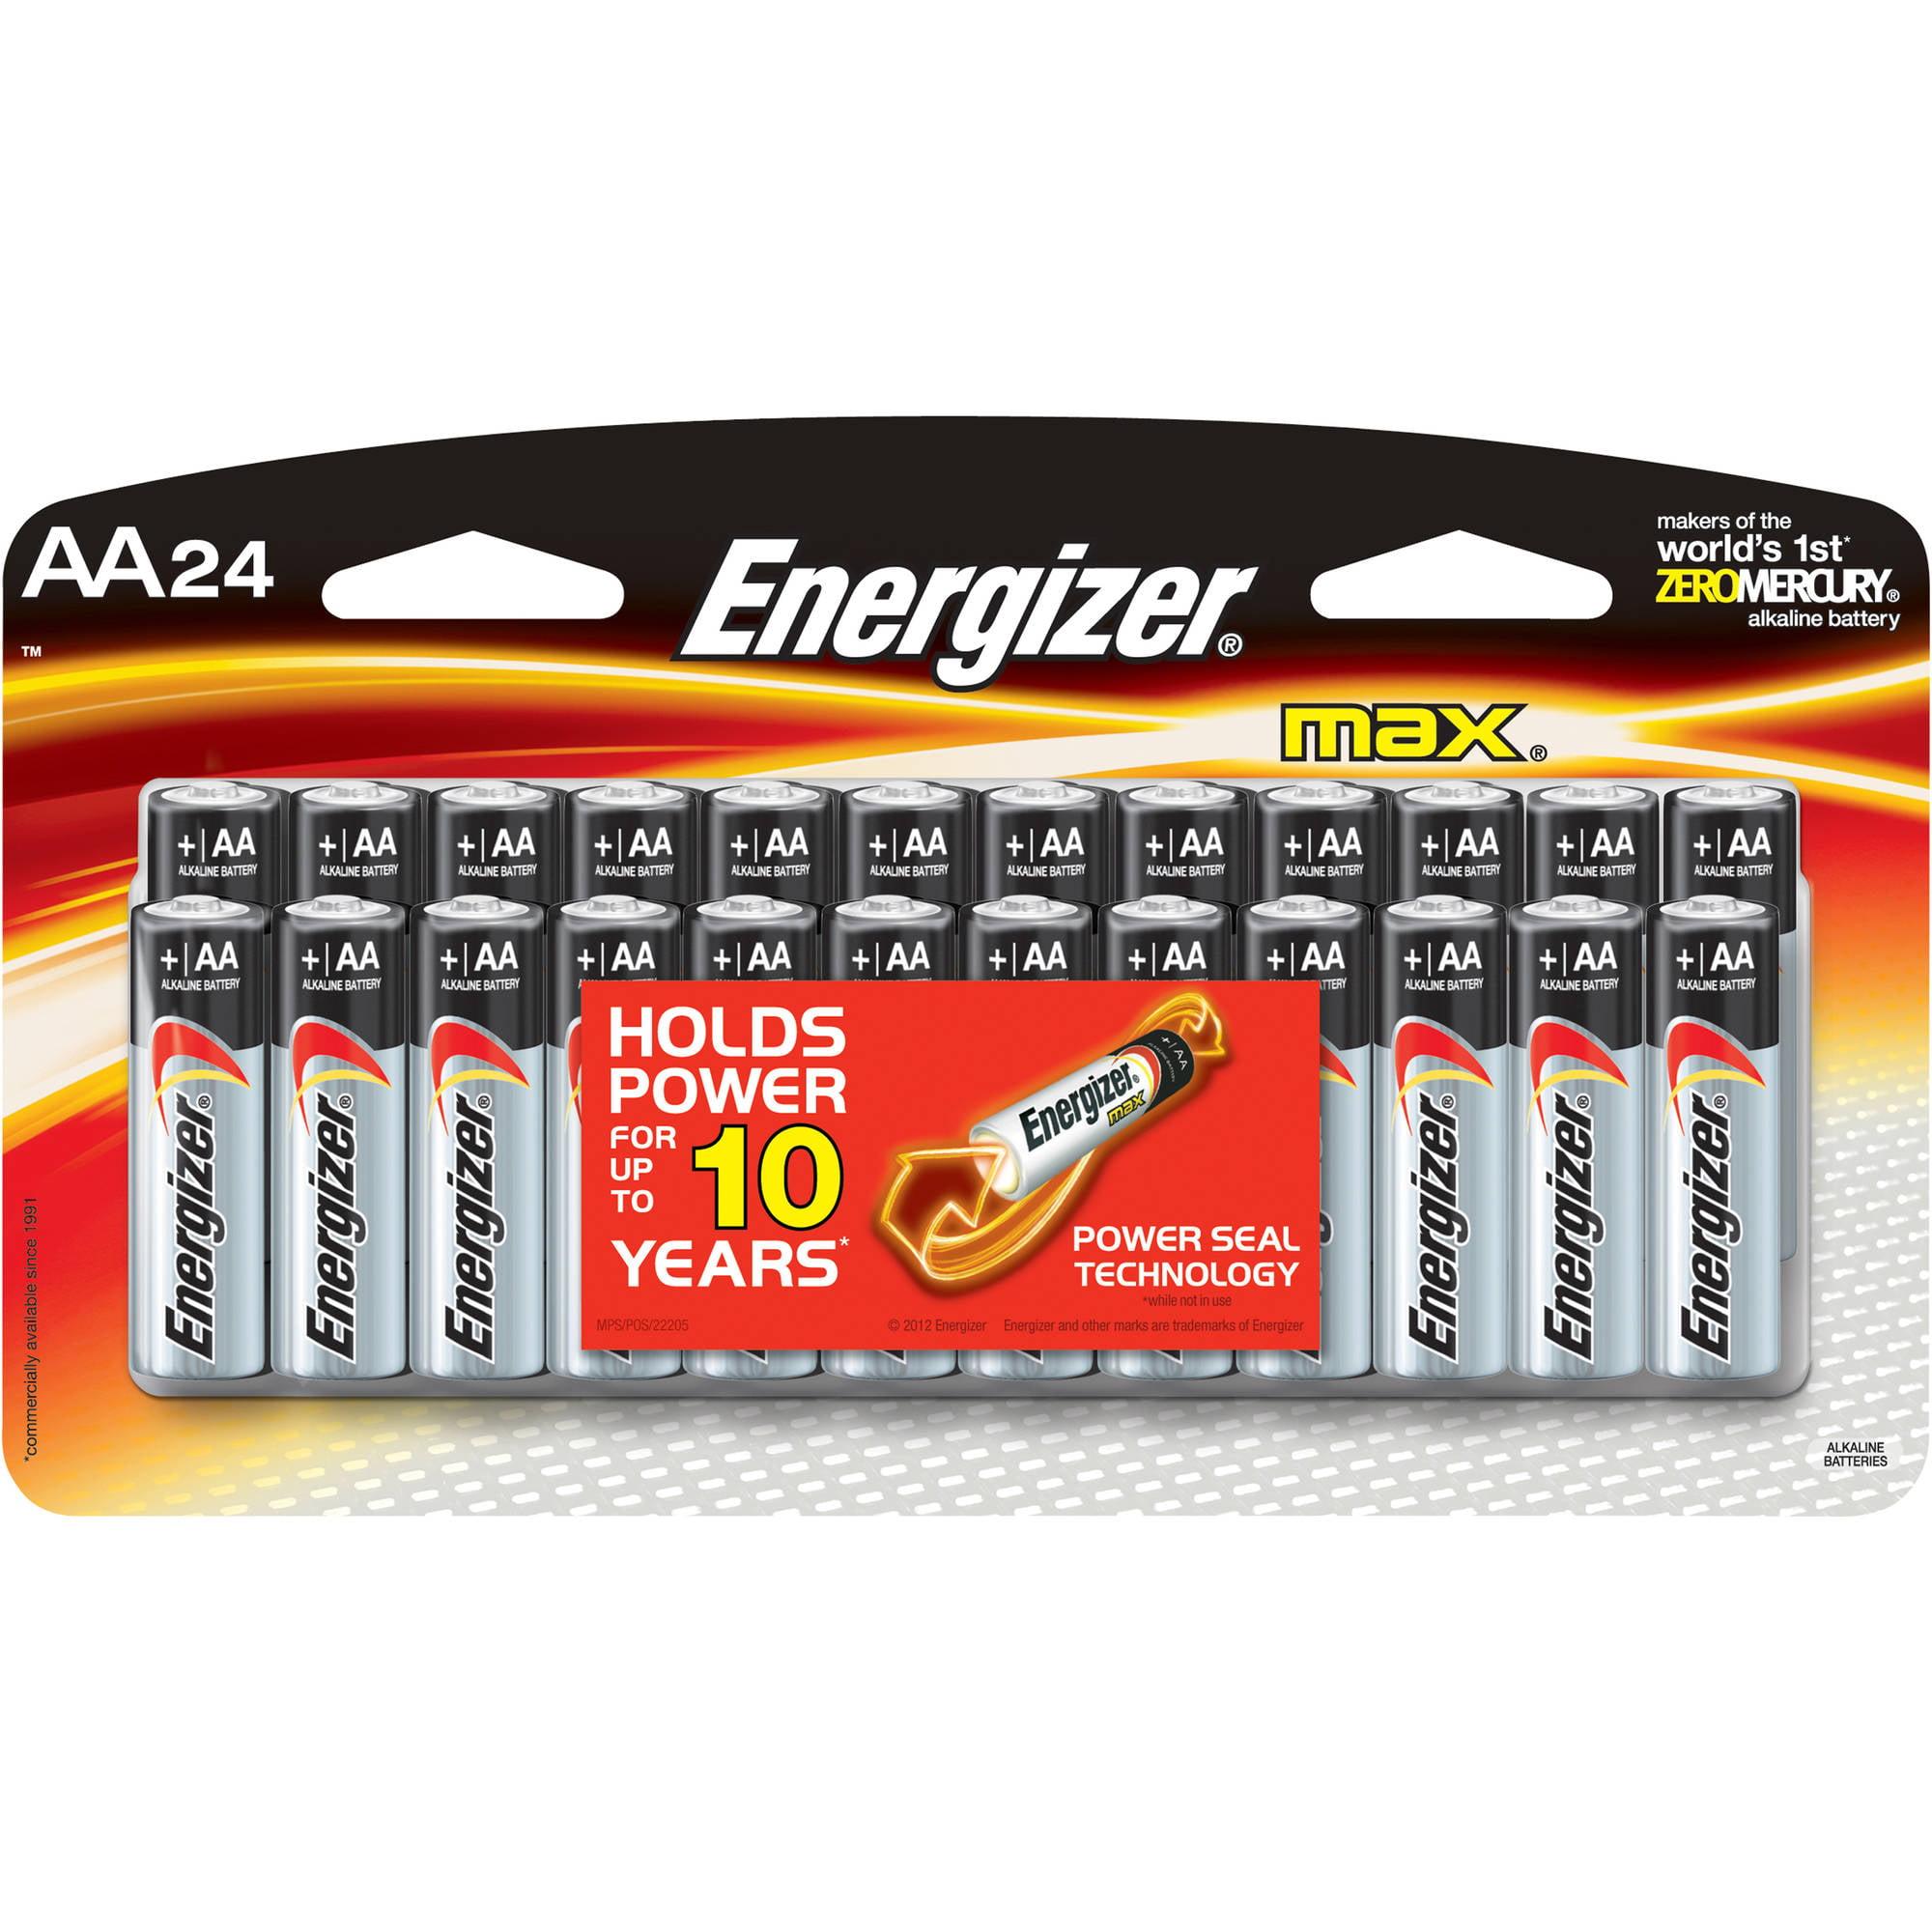 Energizer MAX AA Batteries, 24pk